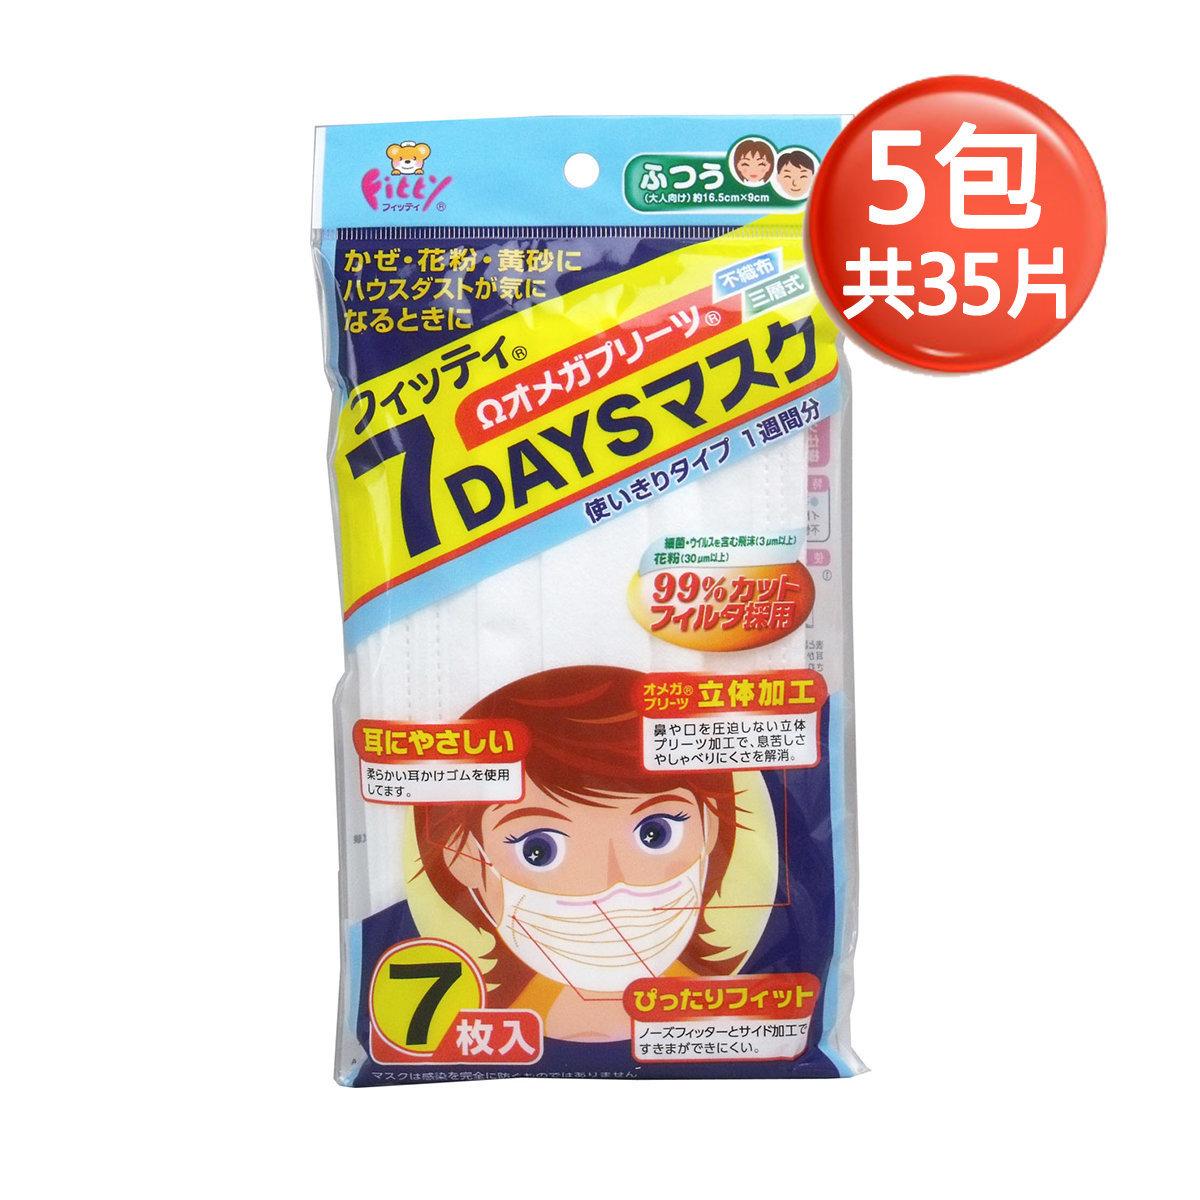 (行貨) 日本Fitty立體三層成人口罩7片*5包 - VFE / BFE / PFE > 99%